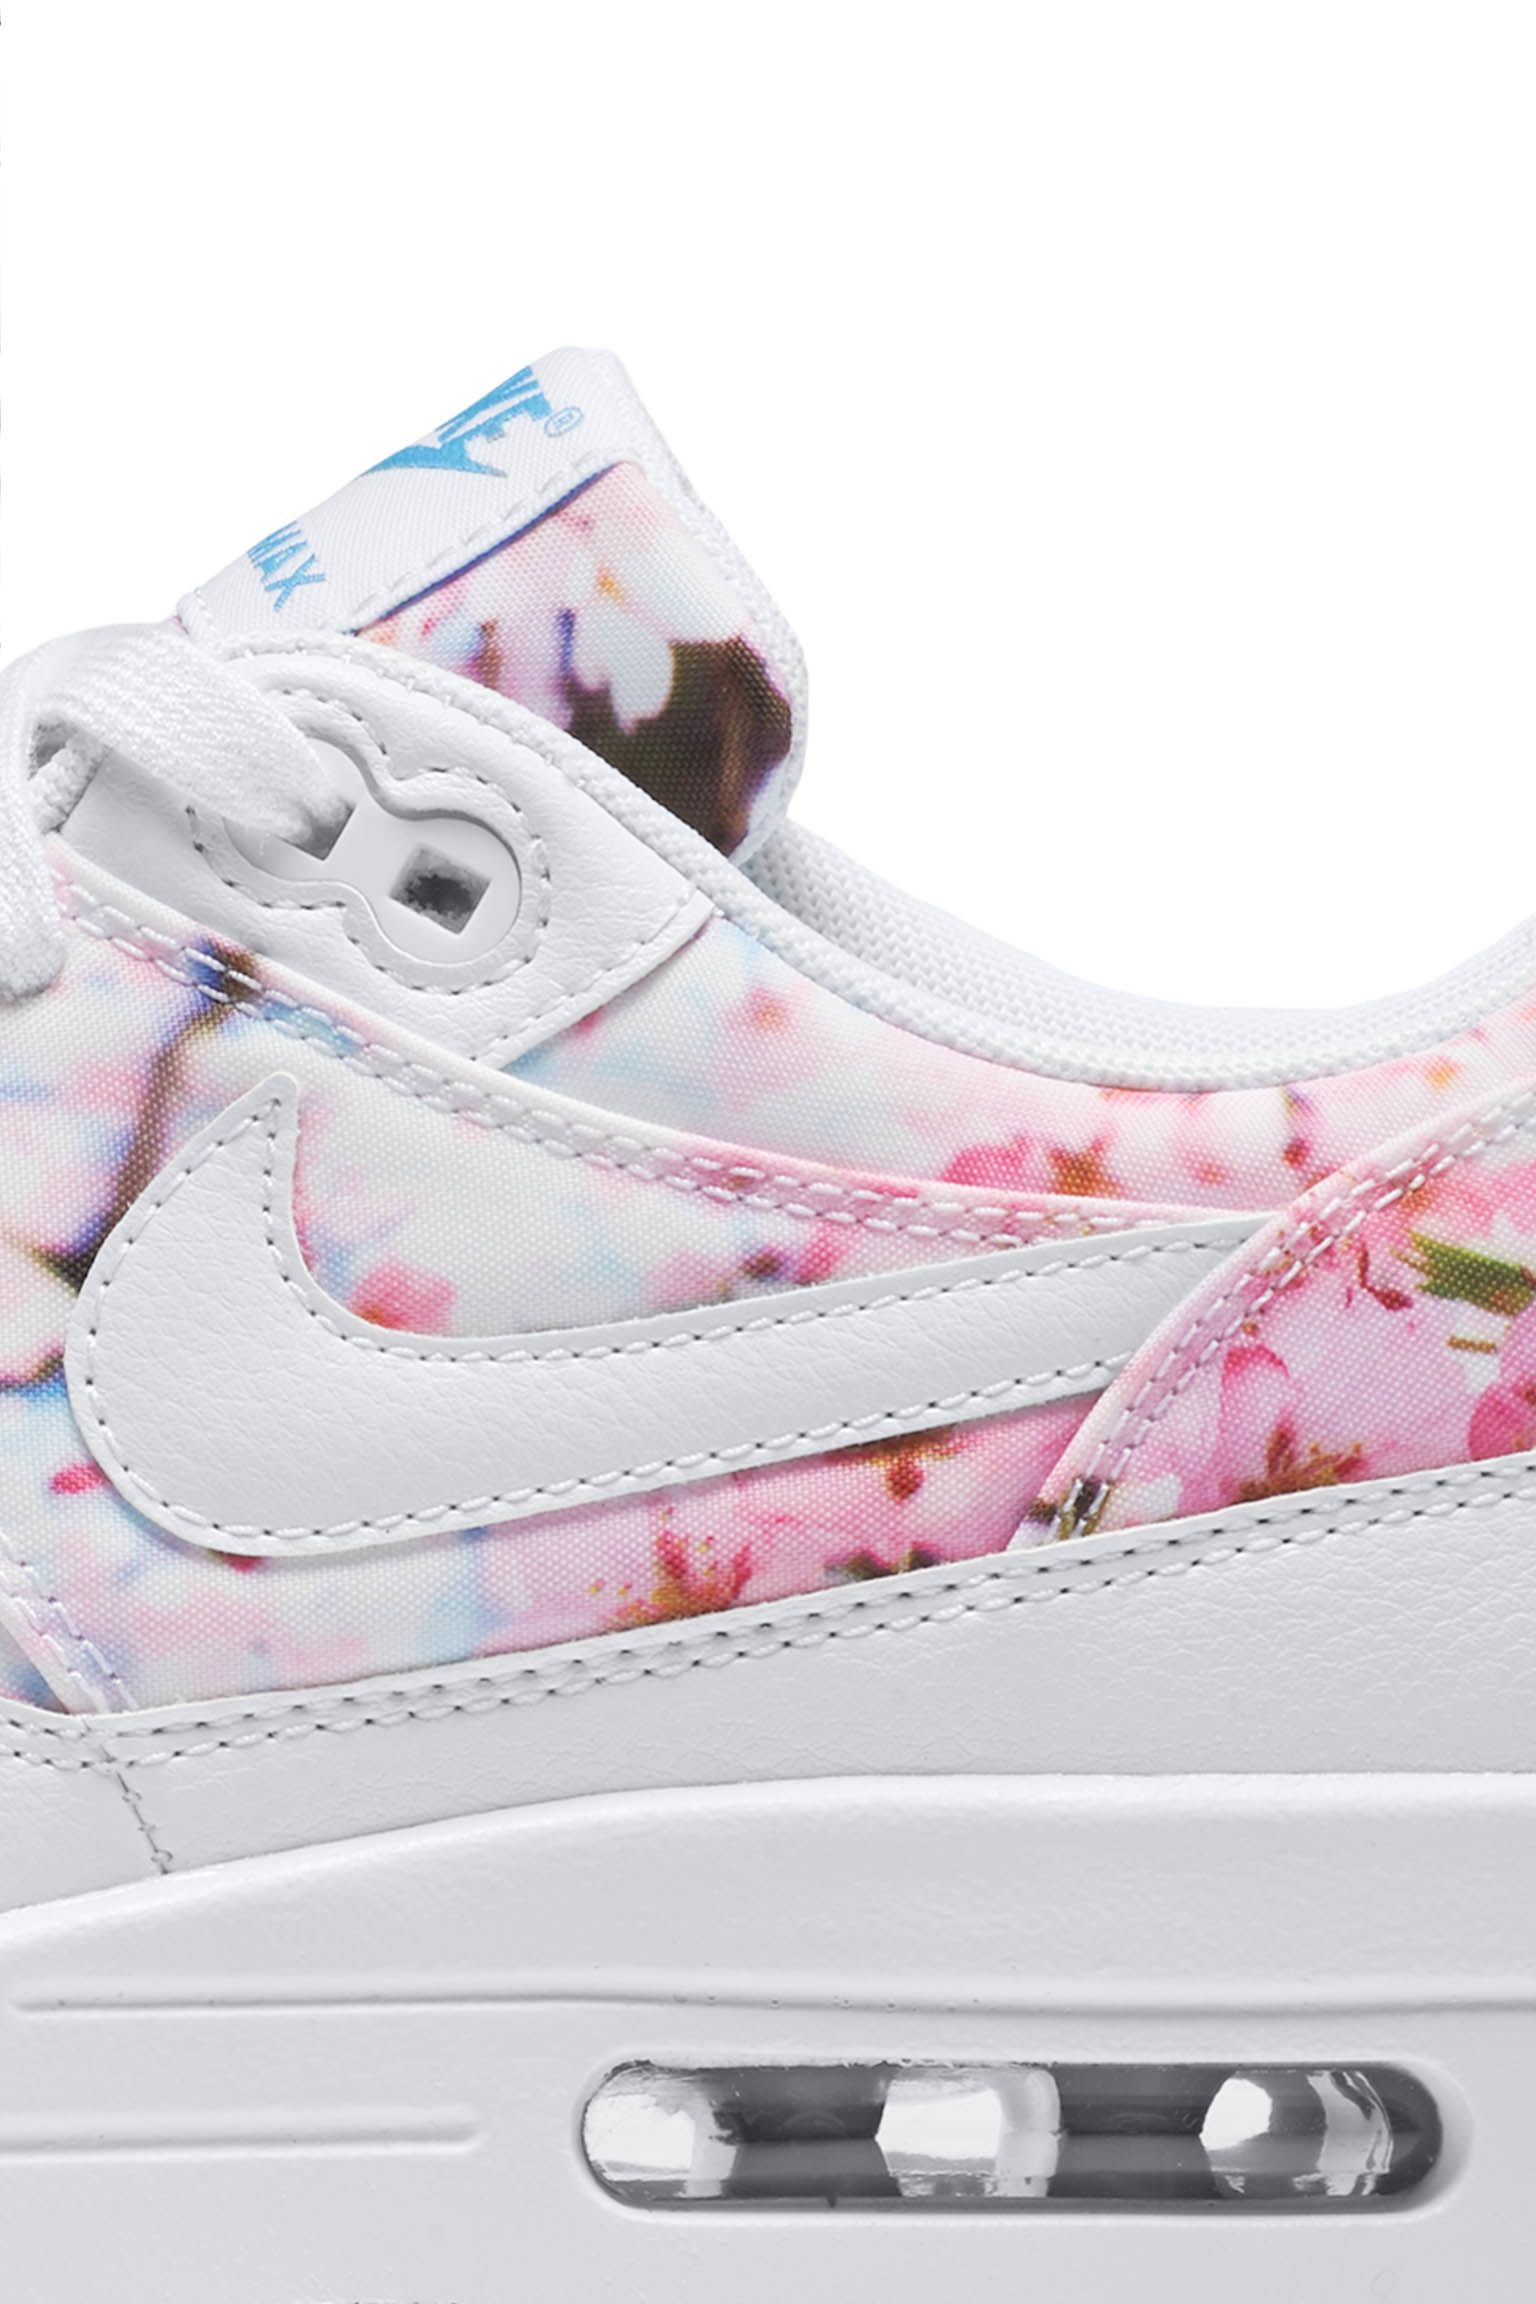 Women's Nike Air Max 1 'Cherry Blossom'